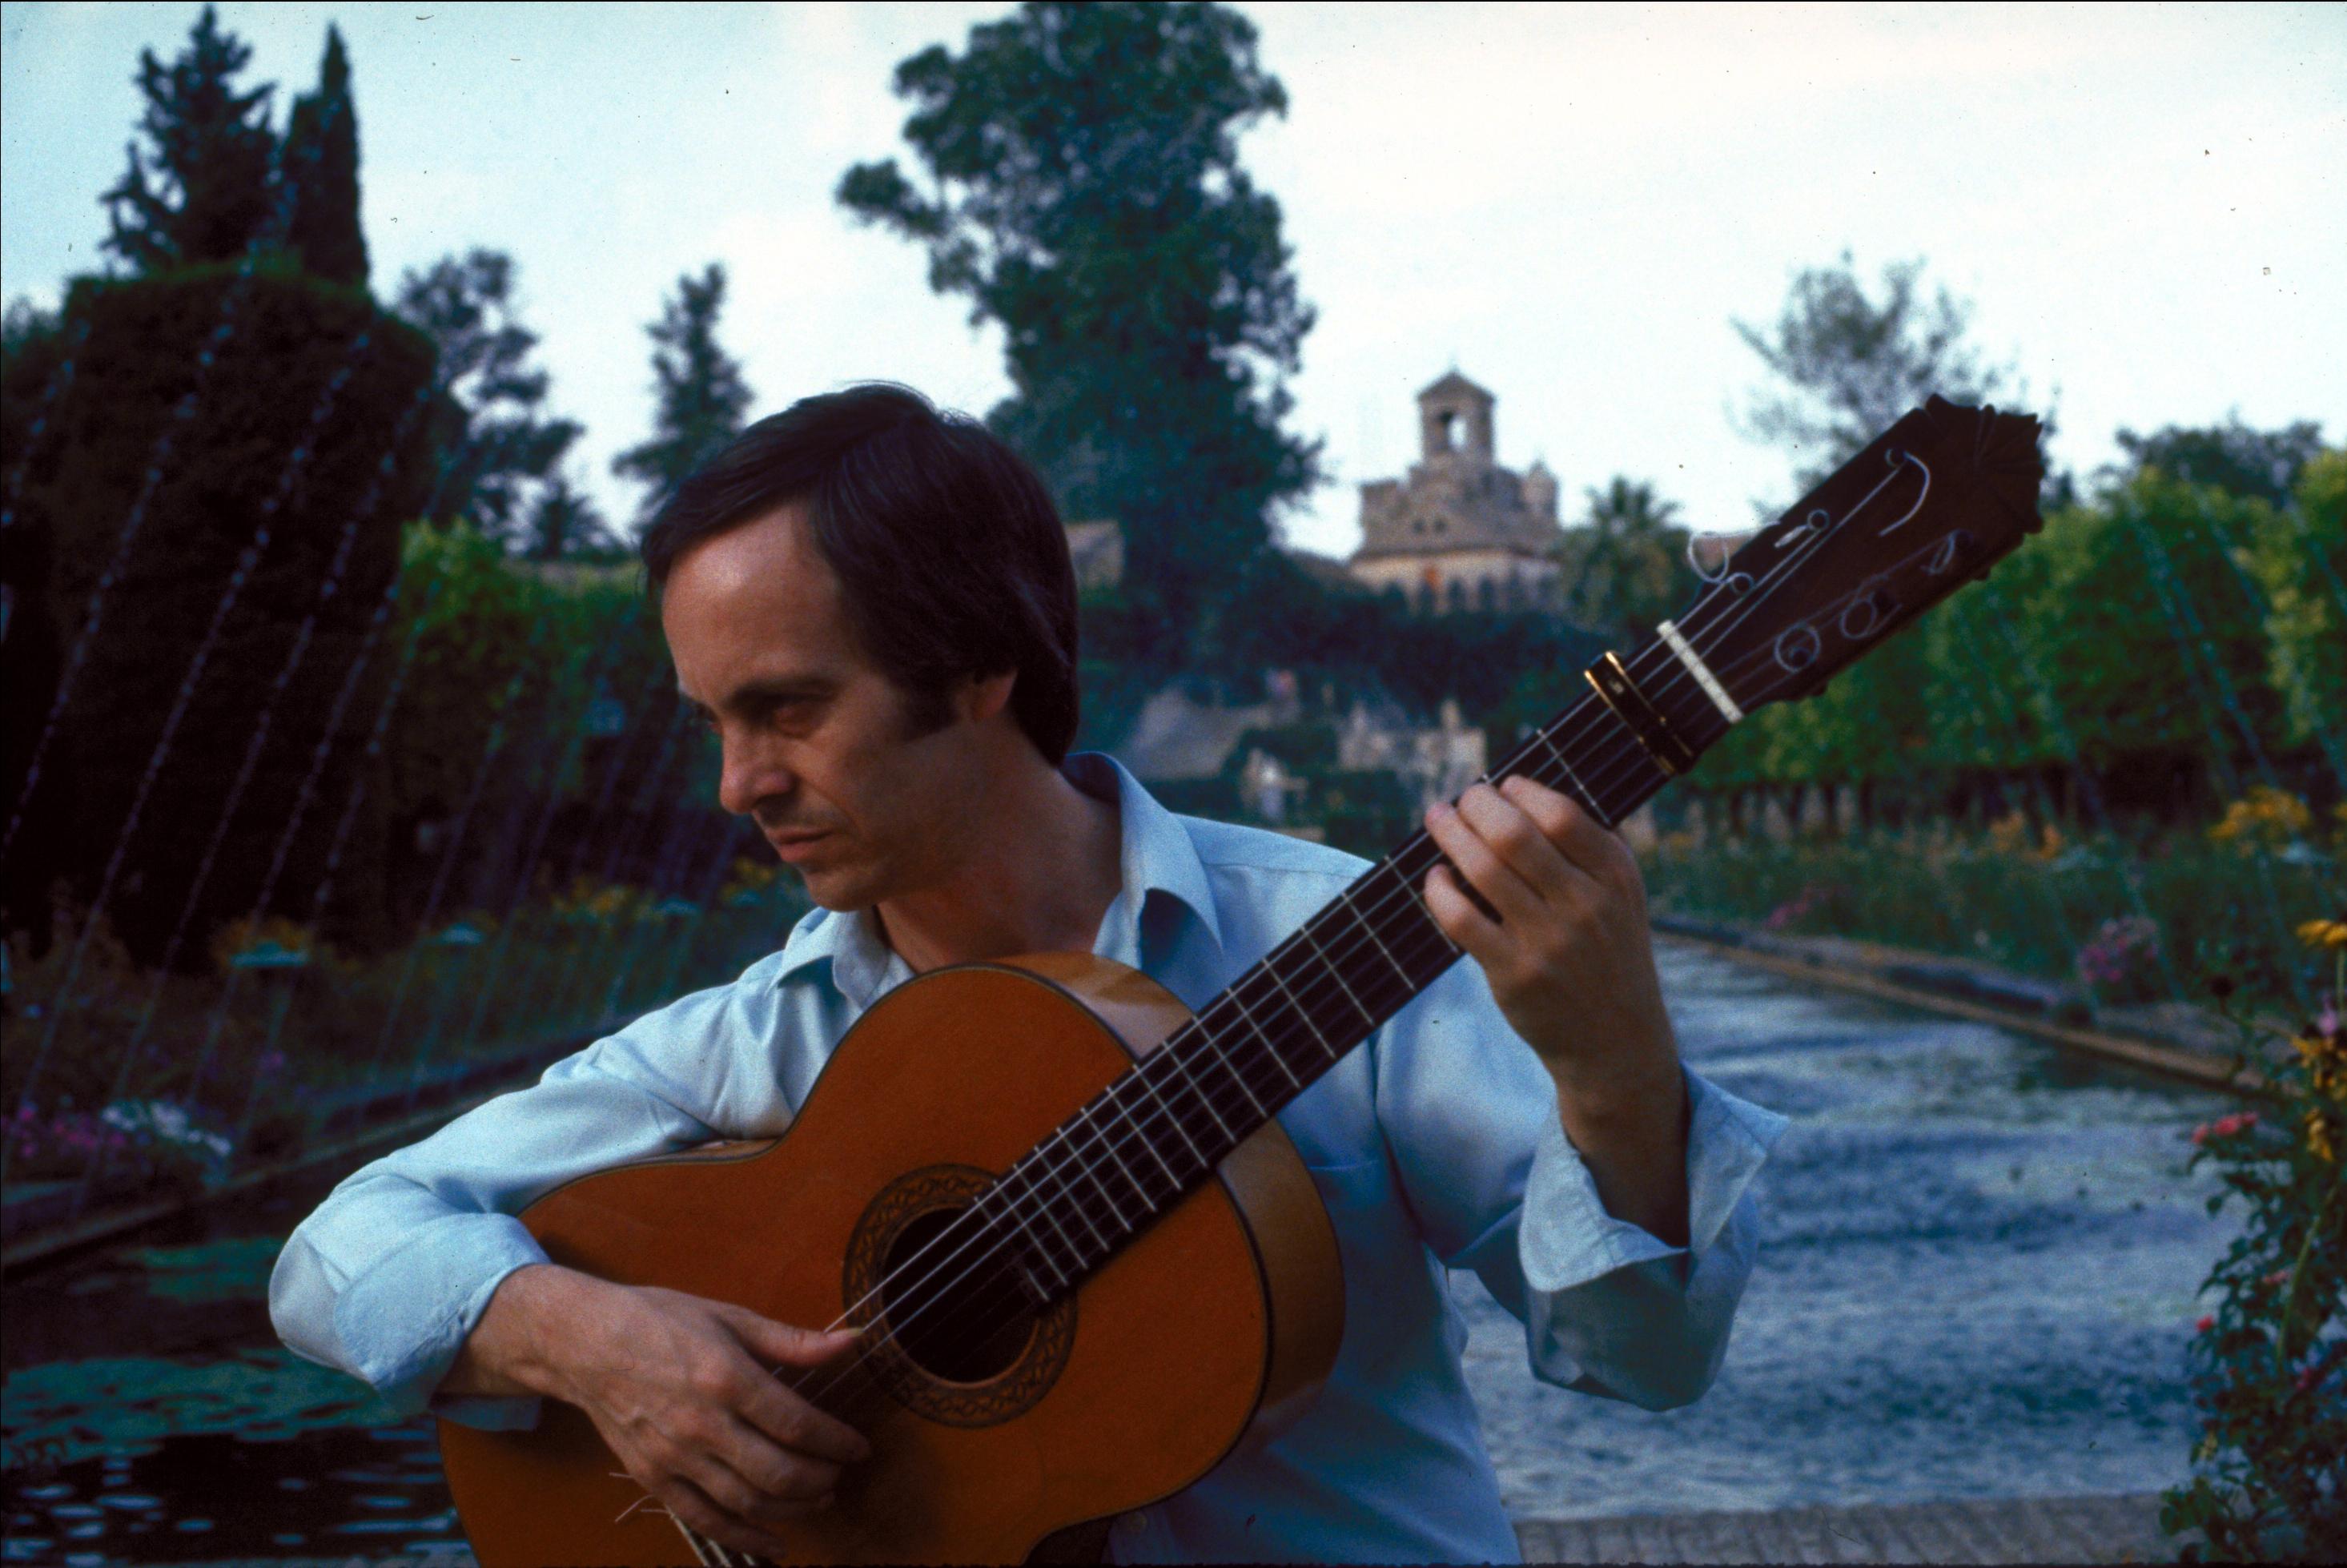 Paco Pena brings his flamenco flare to Australia